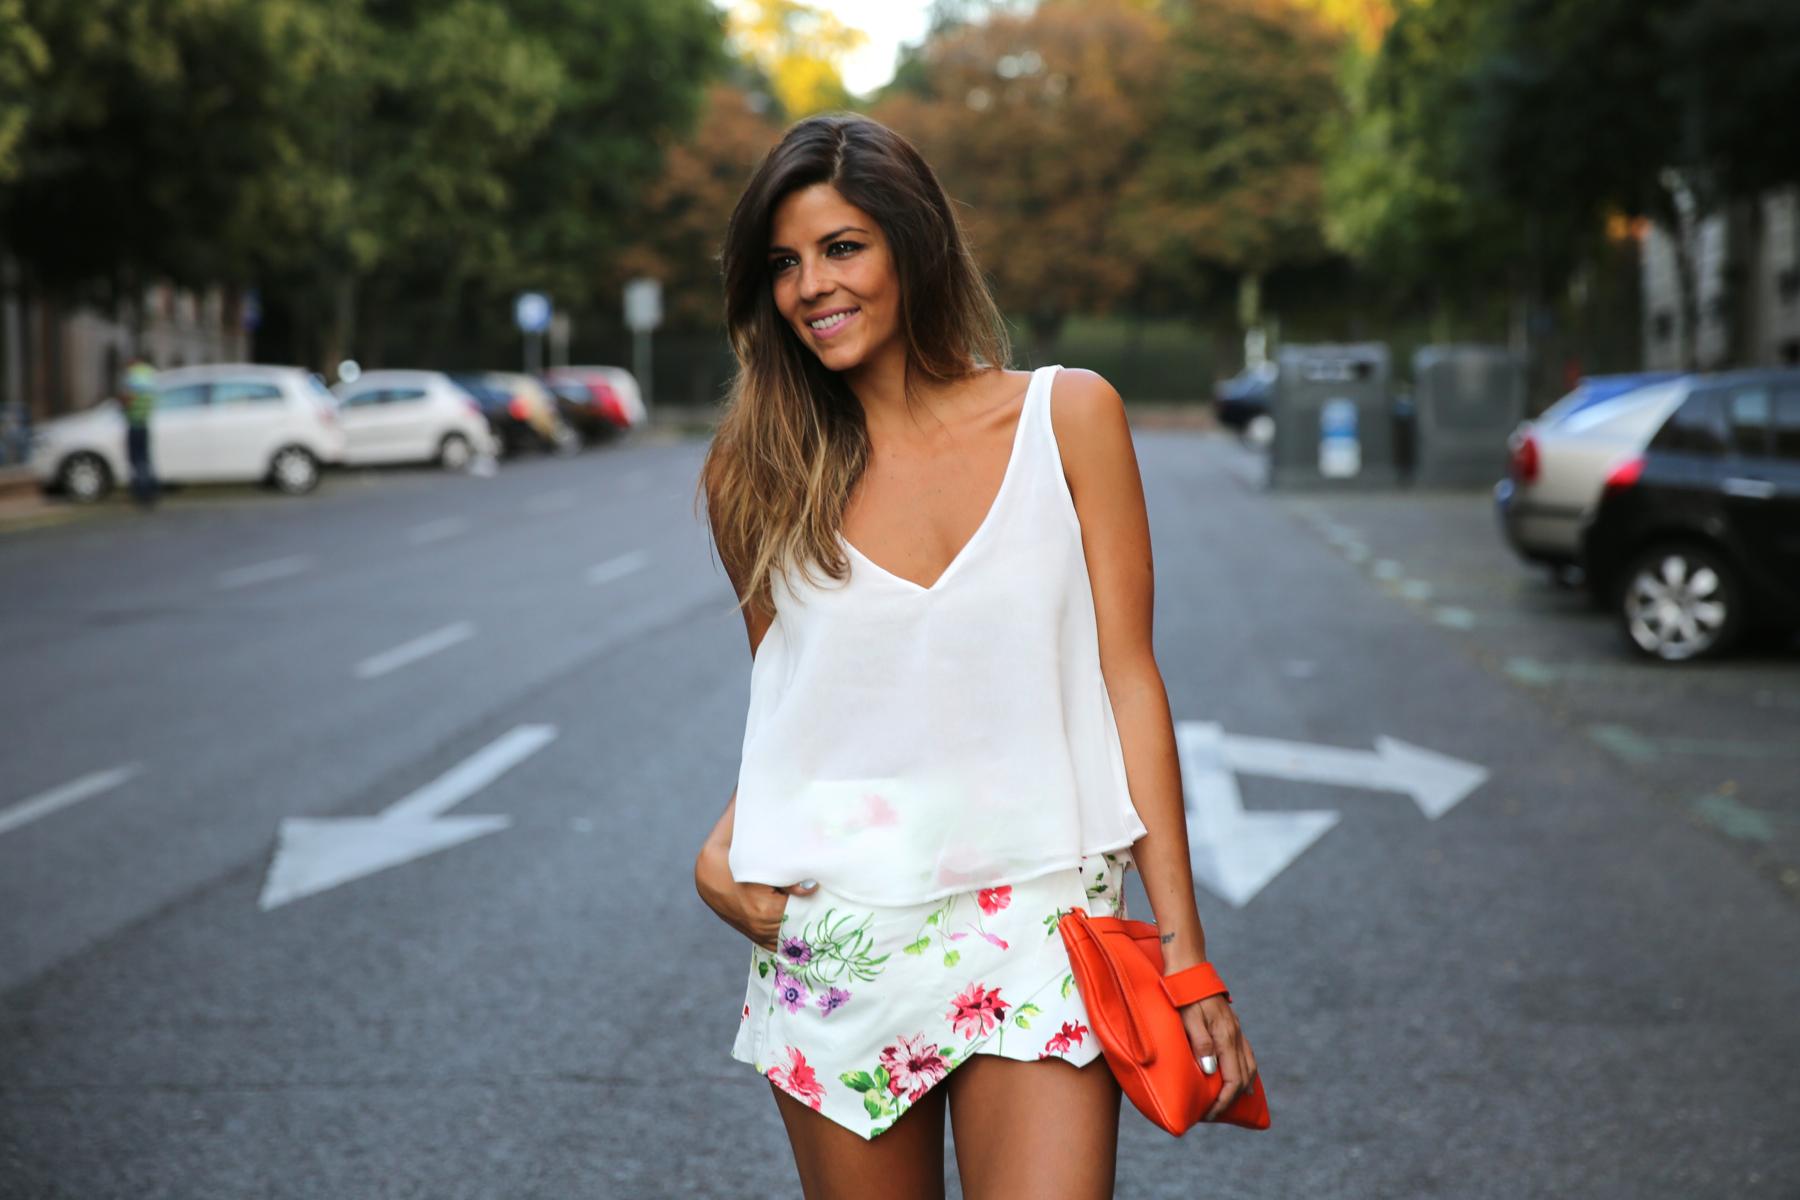 trendy_taste-look-outfit-street_style-ootd-blog-blogger-fashion_spain-moda_españa-sandalias_plateadas-silver_sandals-flower_print-falda_flores-top_blanco-4